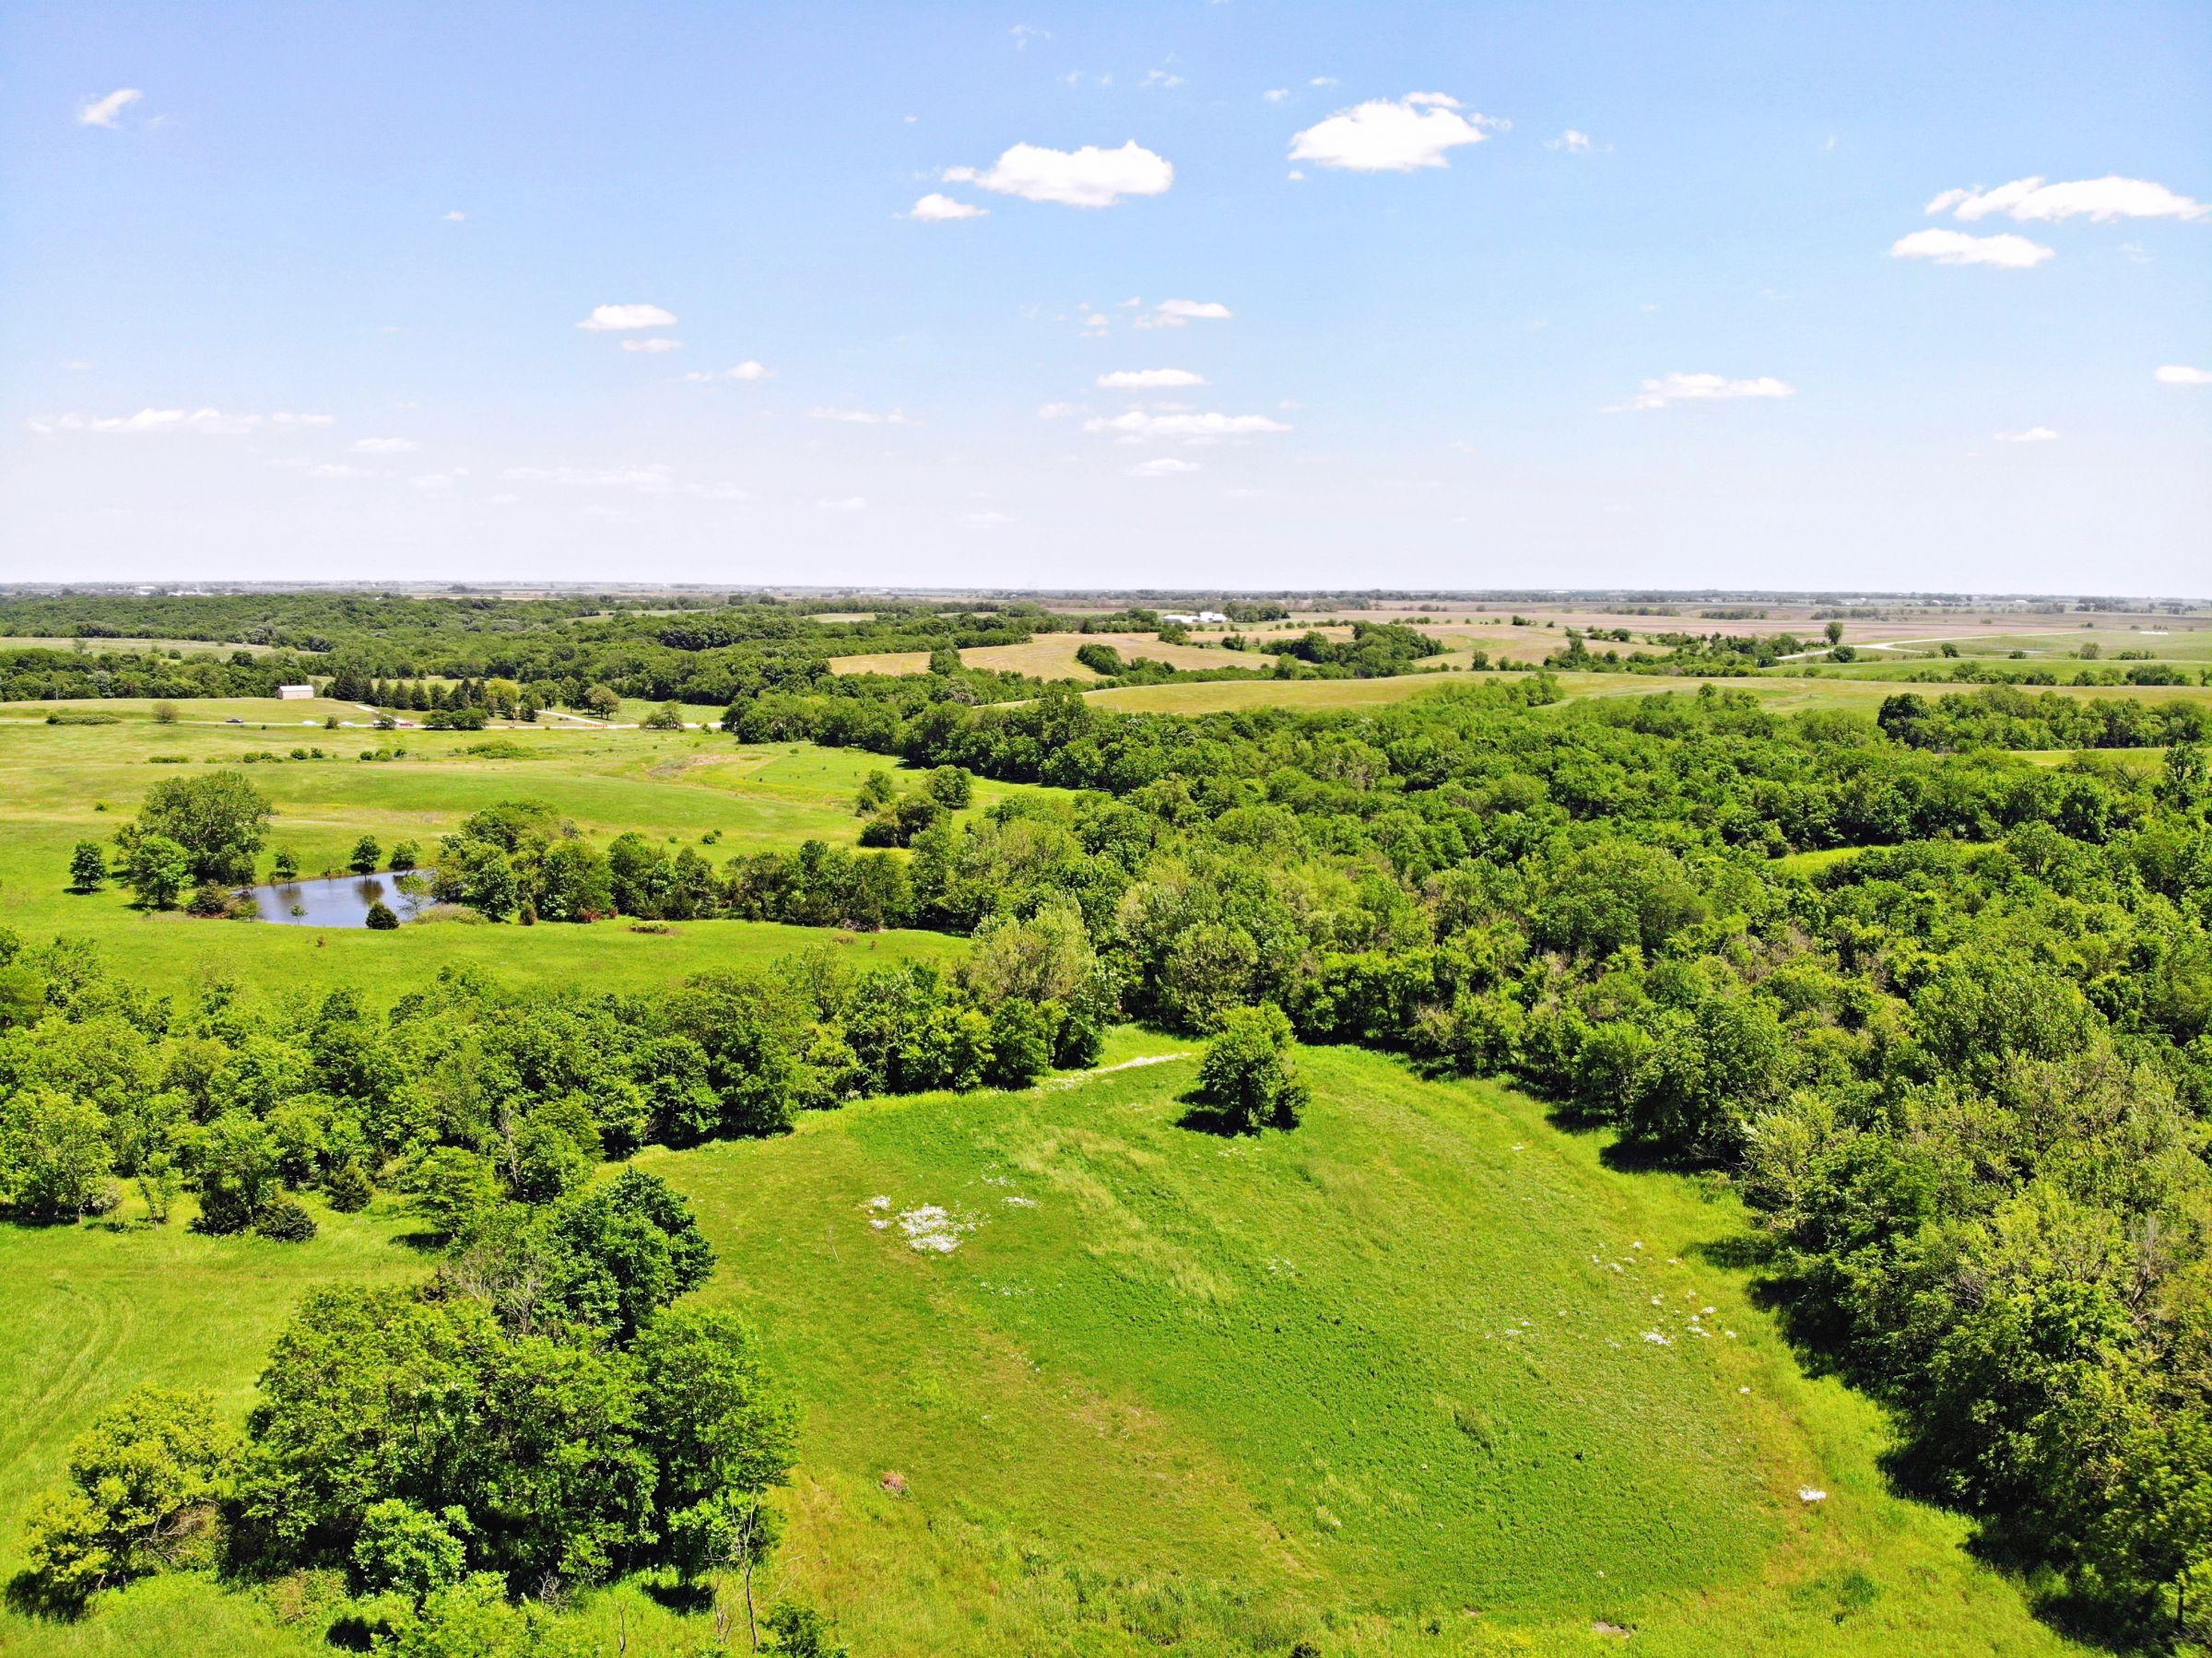 14497-78-acres-clarke-co-ia-4-2019-06-12-160116.jpg